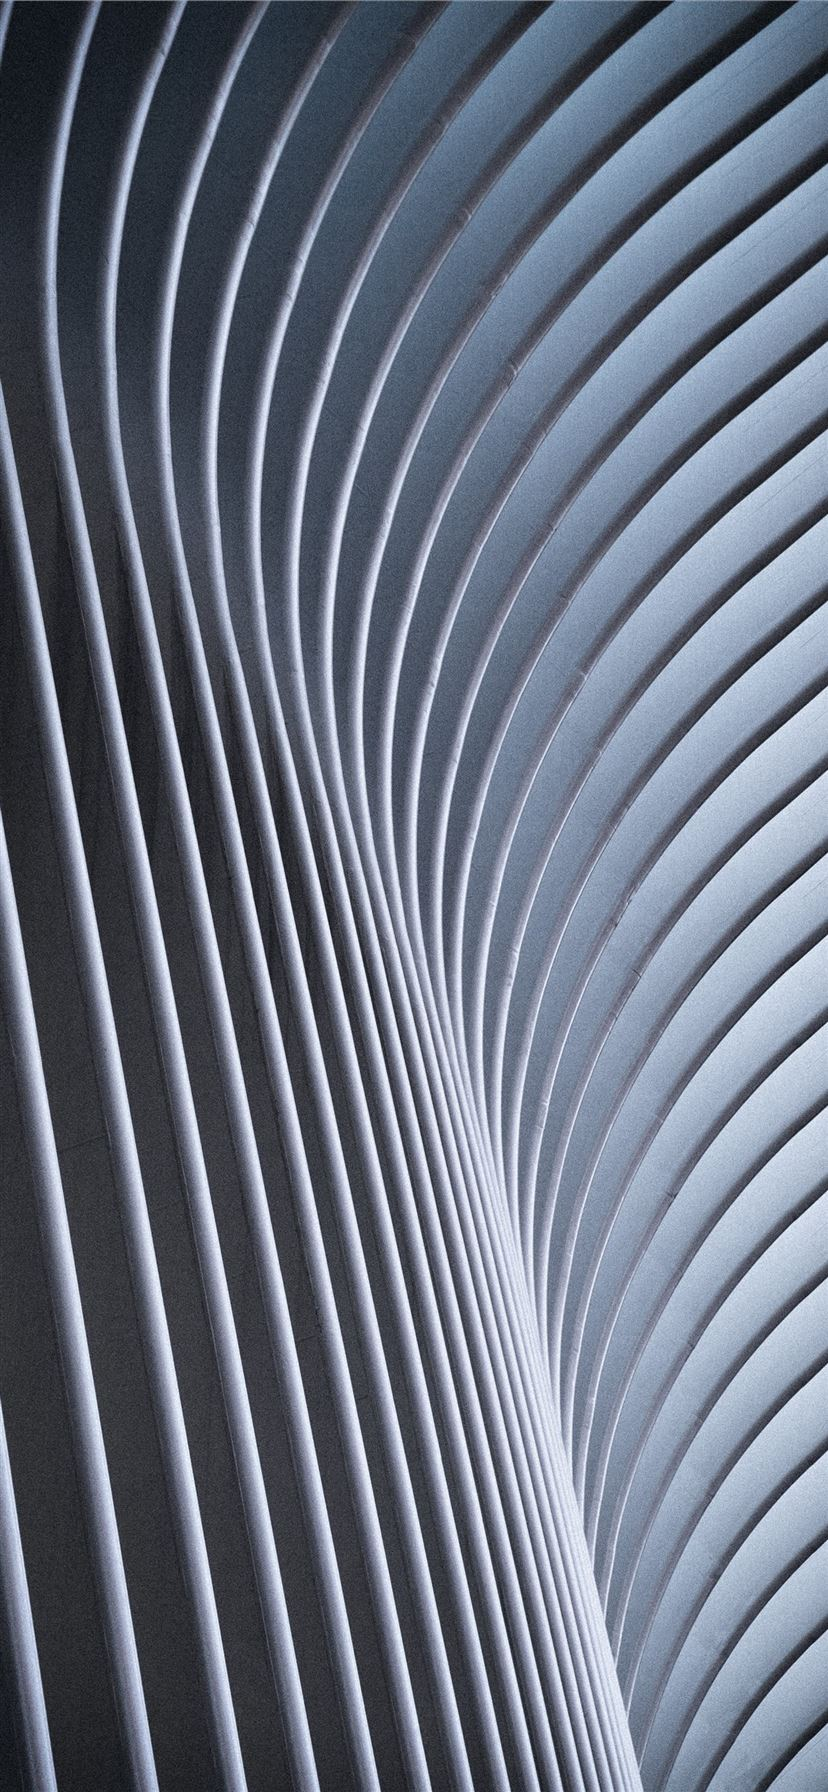 Gray Digital Wallpaper Iphone 11 Wallpapers Free Download